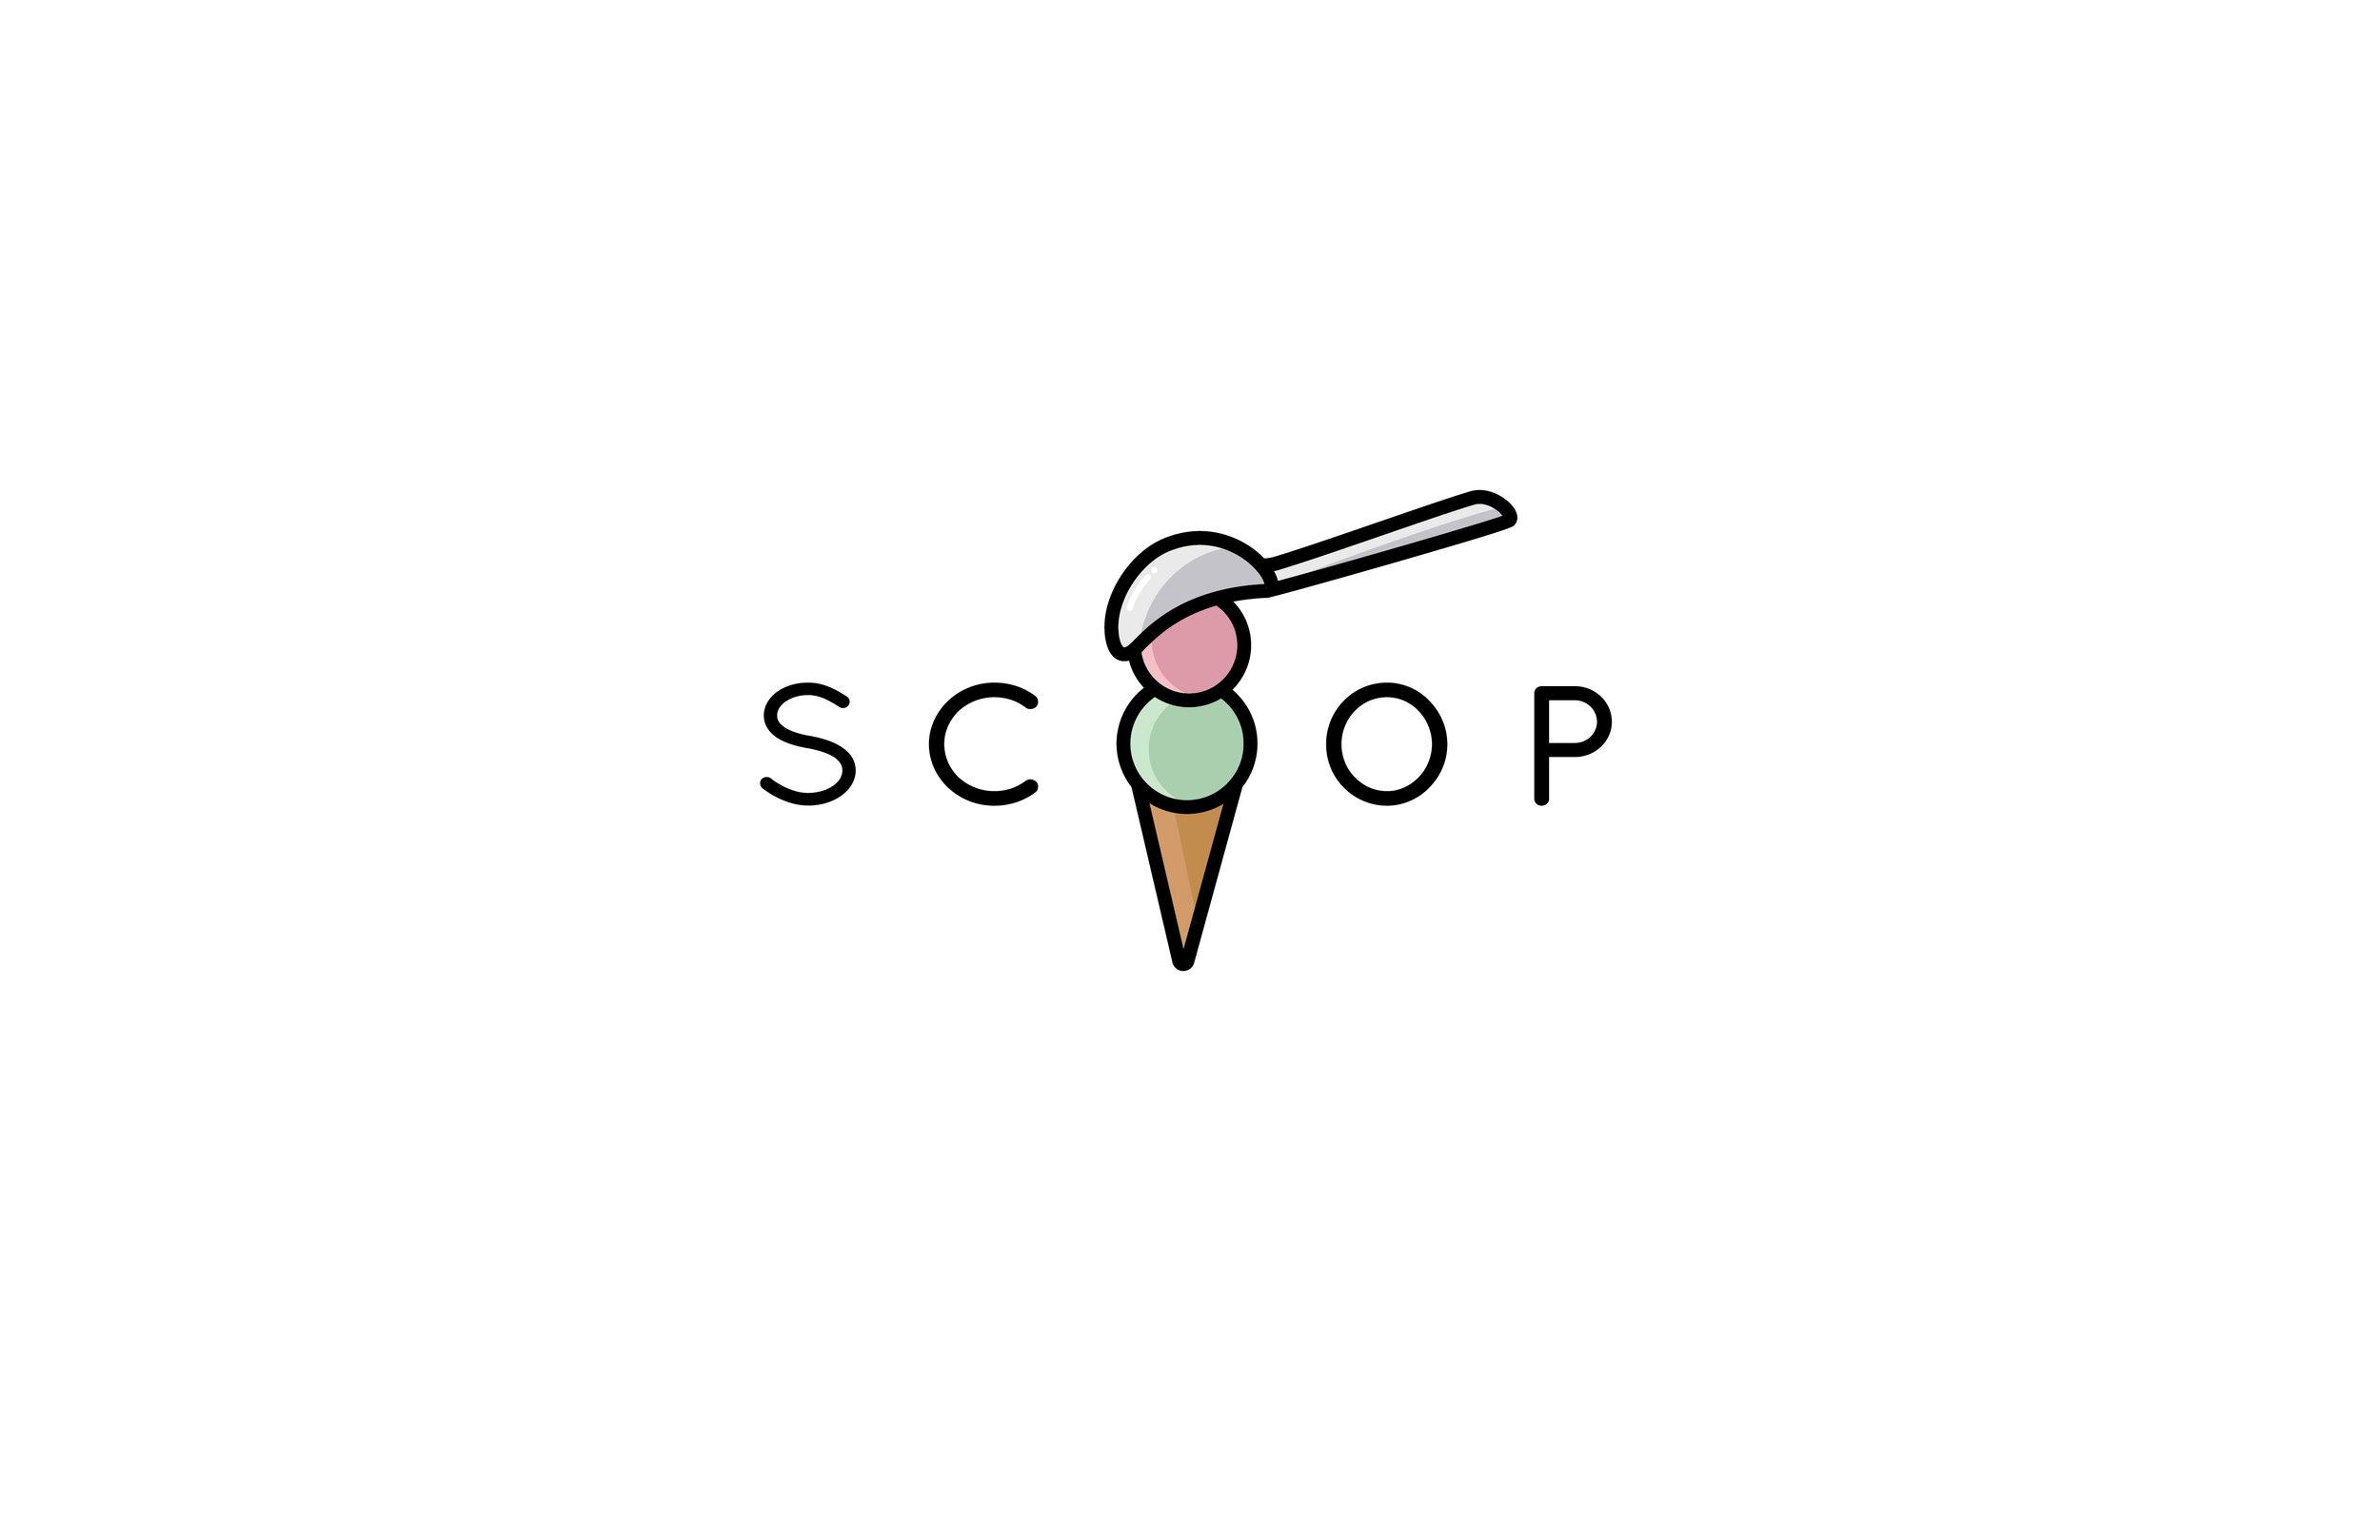 ice-cream-shop-logo